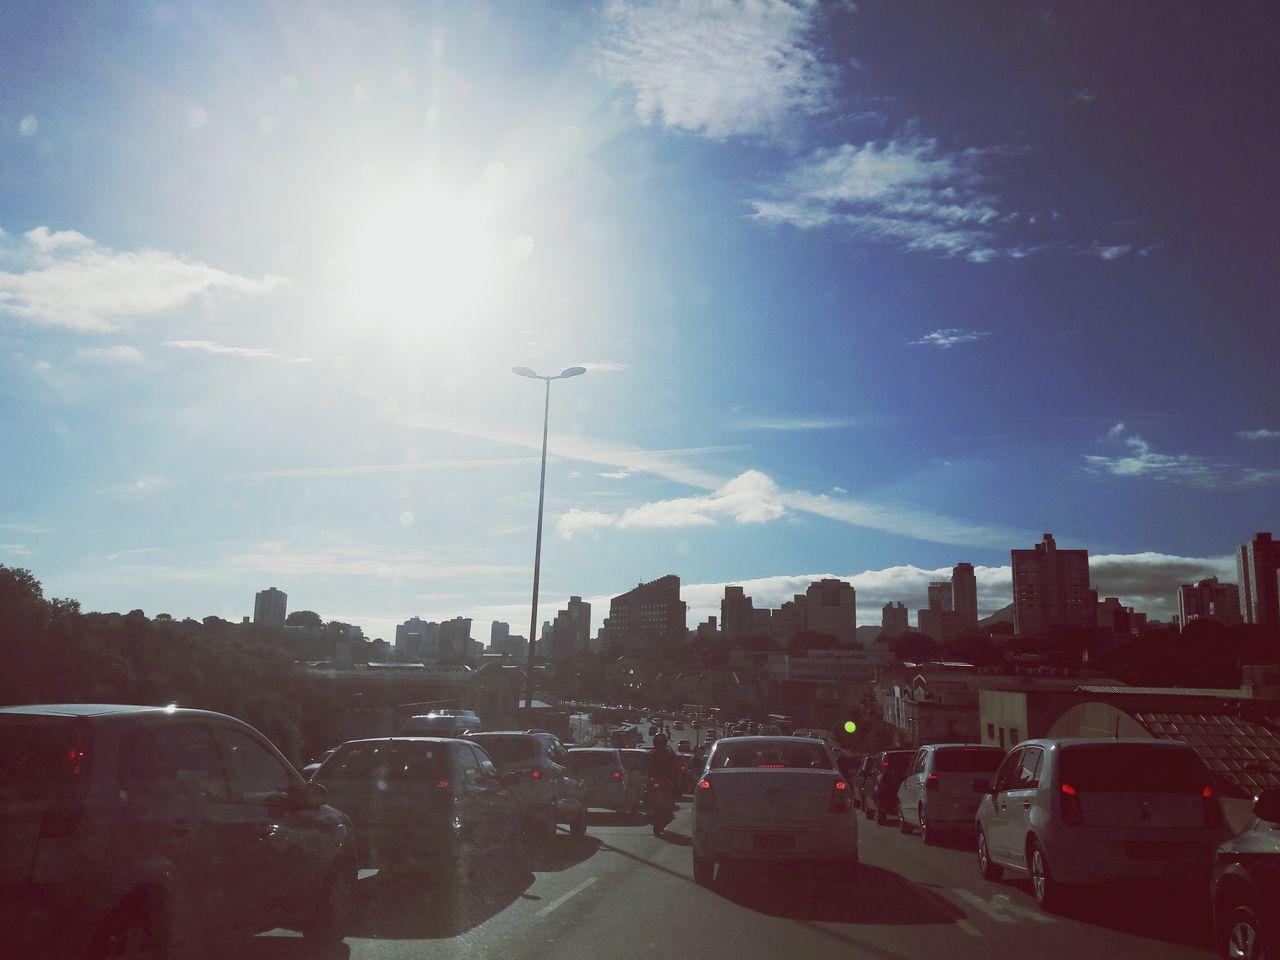 Transportation Street Light Flying Belohorizontecity Cloud - Sky Nature Sun Outdoors No People Sky Day Bhcity